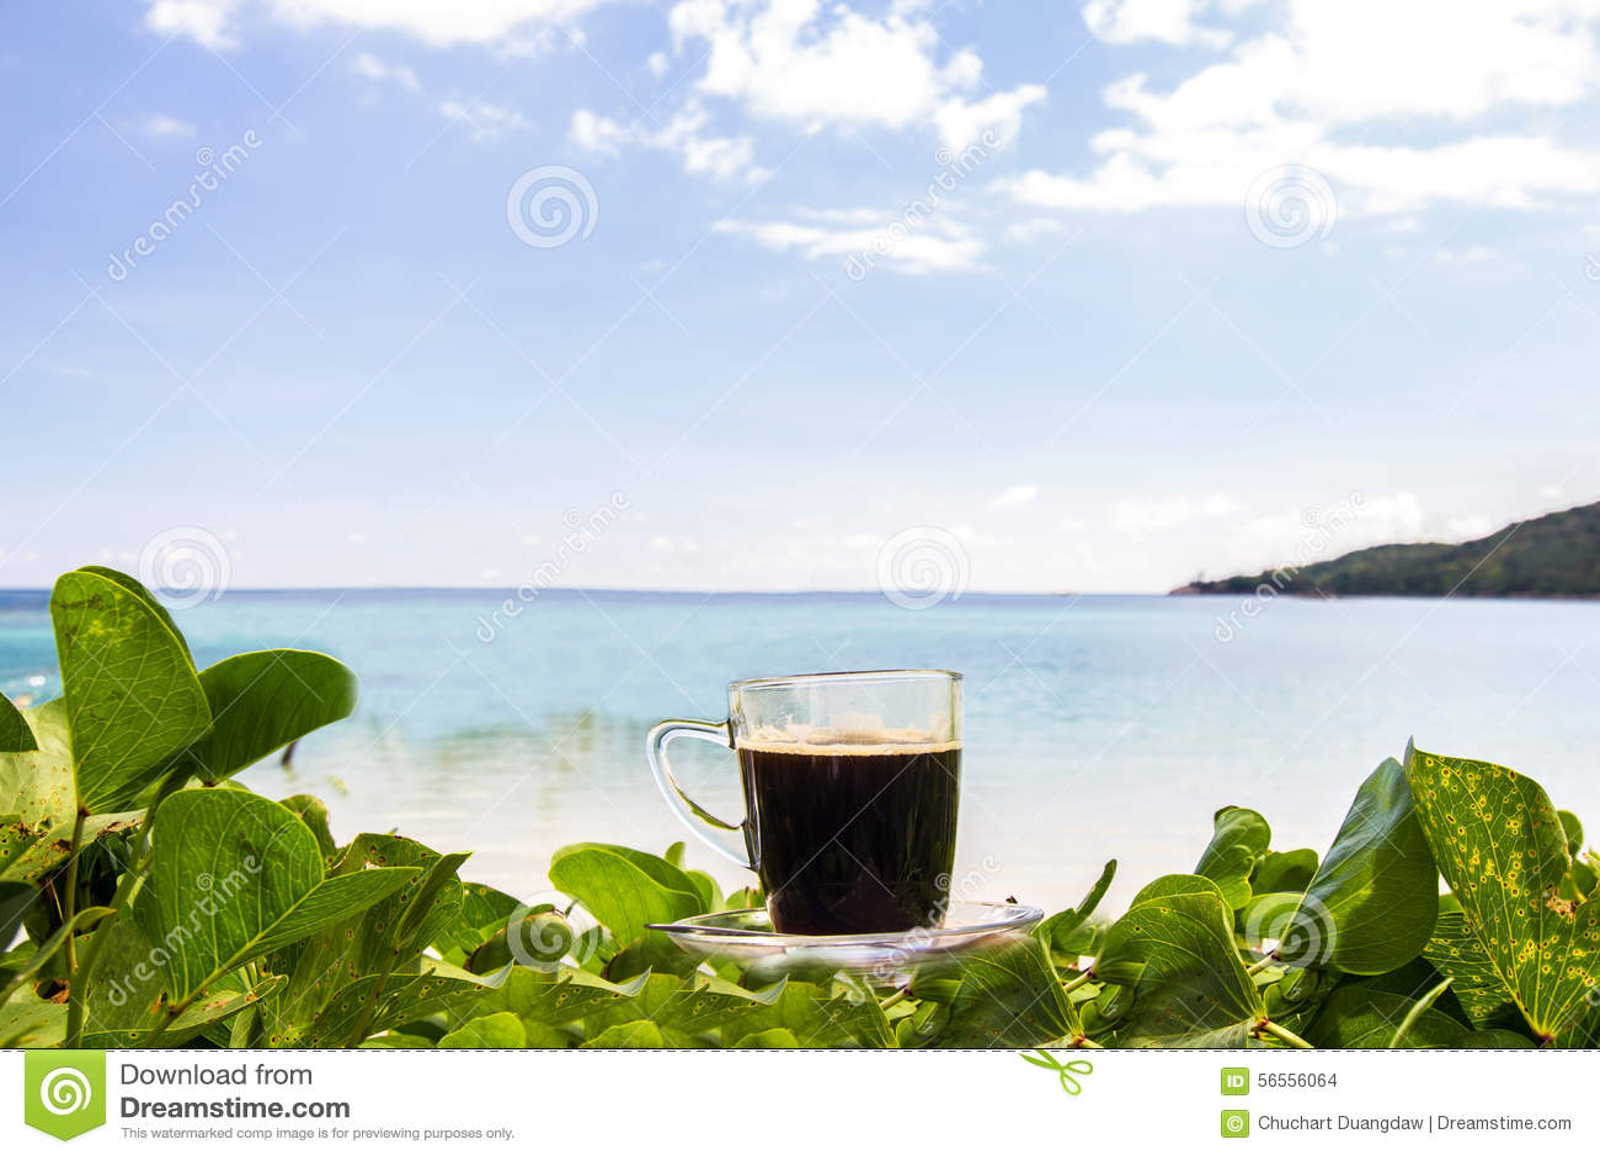 Download Μαύρος καφές με τις απόψεις σχετικά με την παραλία και το μπλε ουρανό Στοκ Εικόνες - εικόνα από ποτό, ηλιοβασίλεμα: 56556064